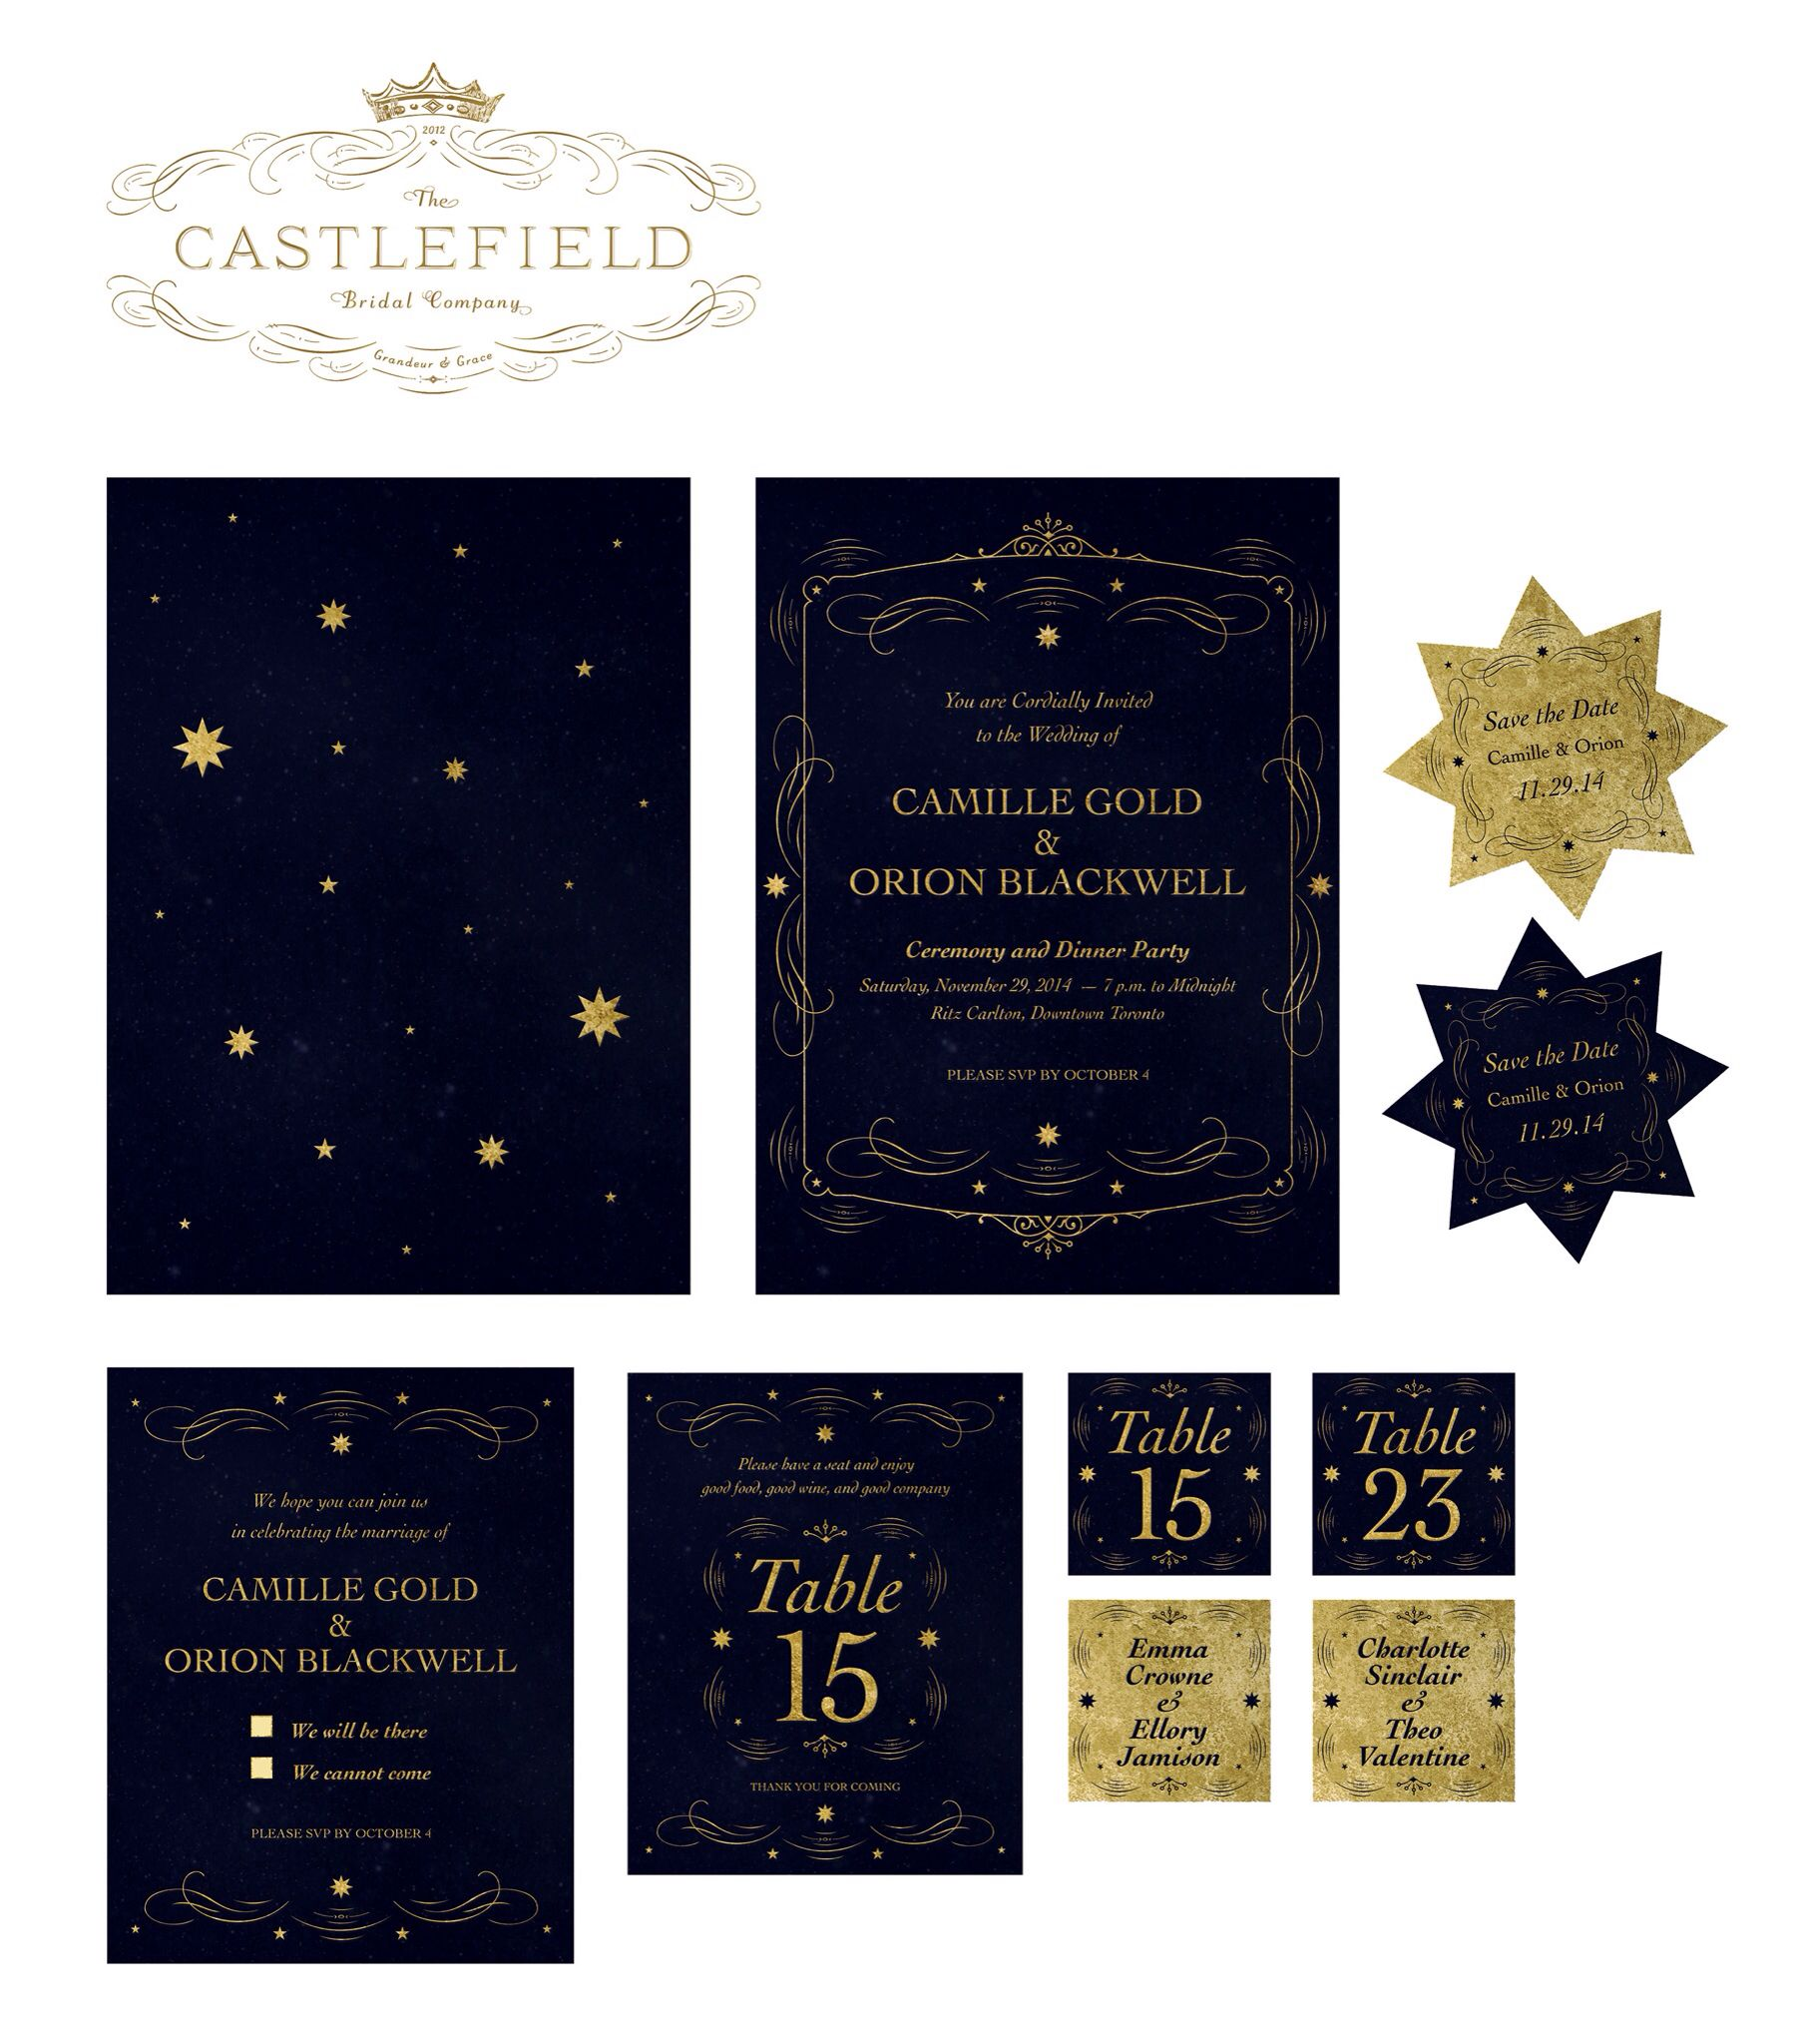 castlefield bridal celestial invitation design www